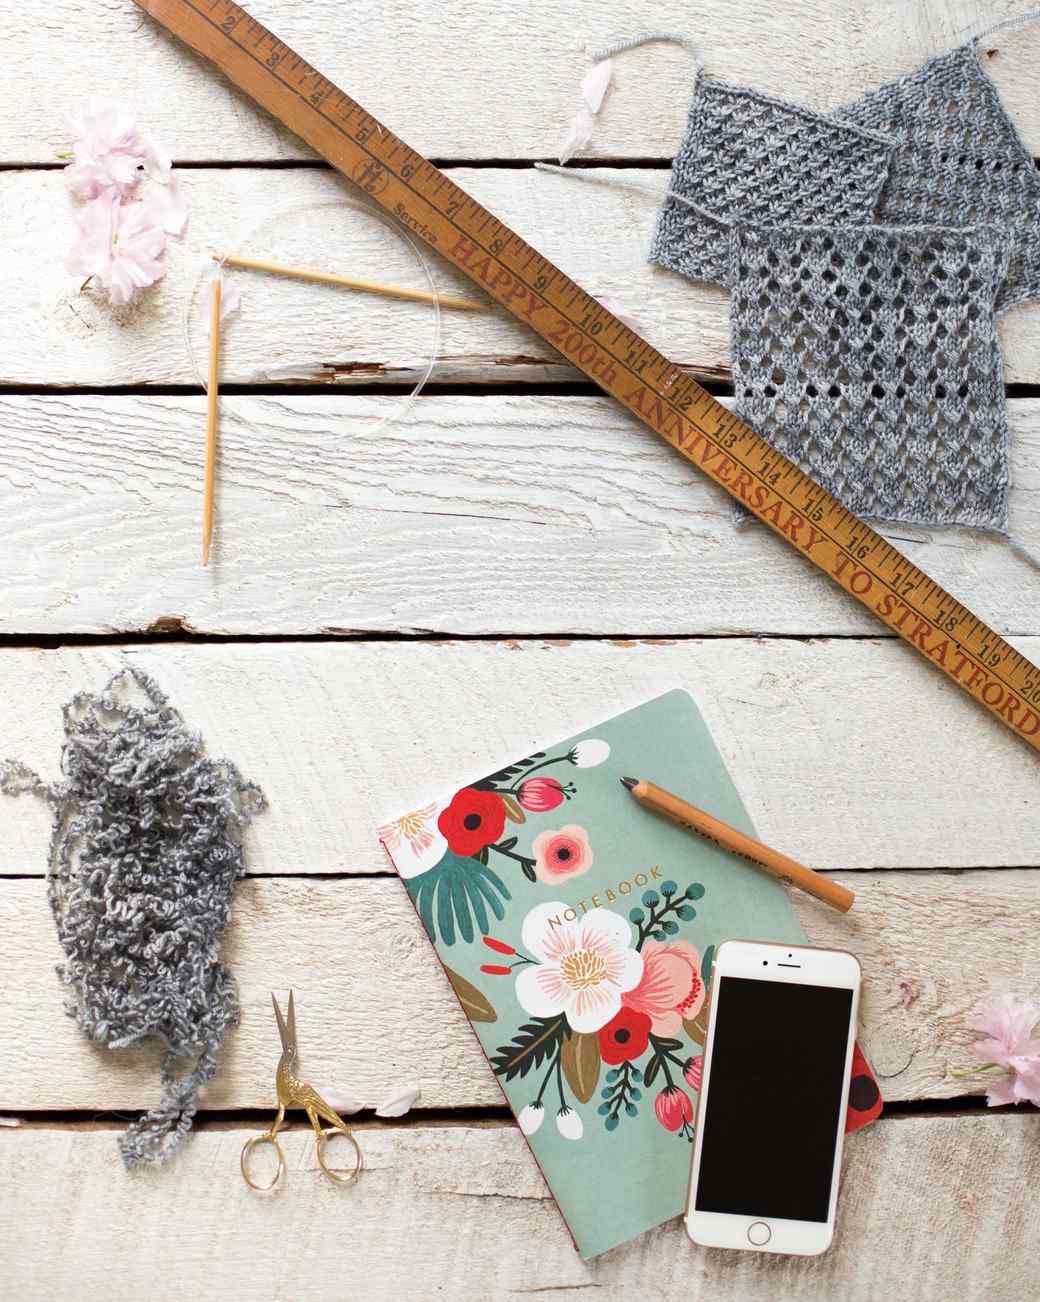 How to Make a Lace Shawl | Martha Stewart